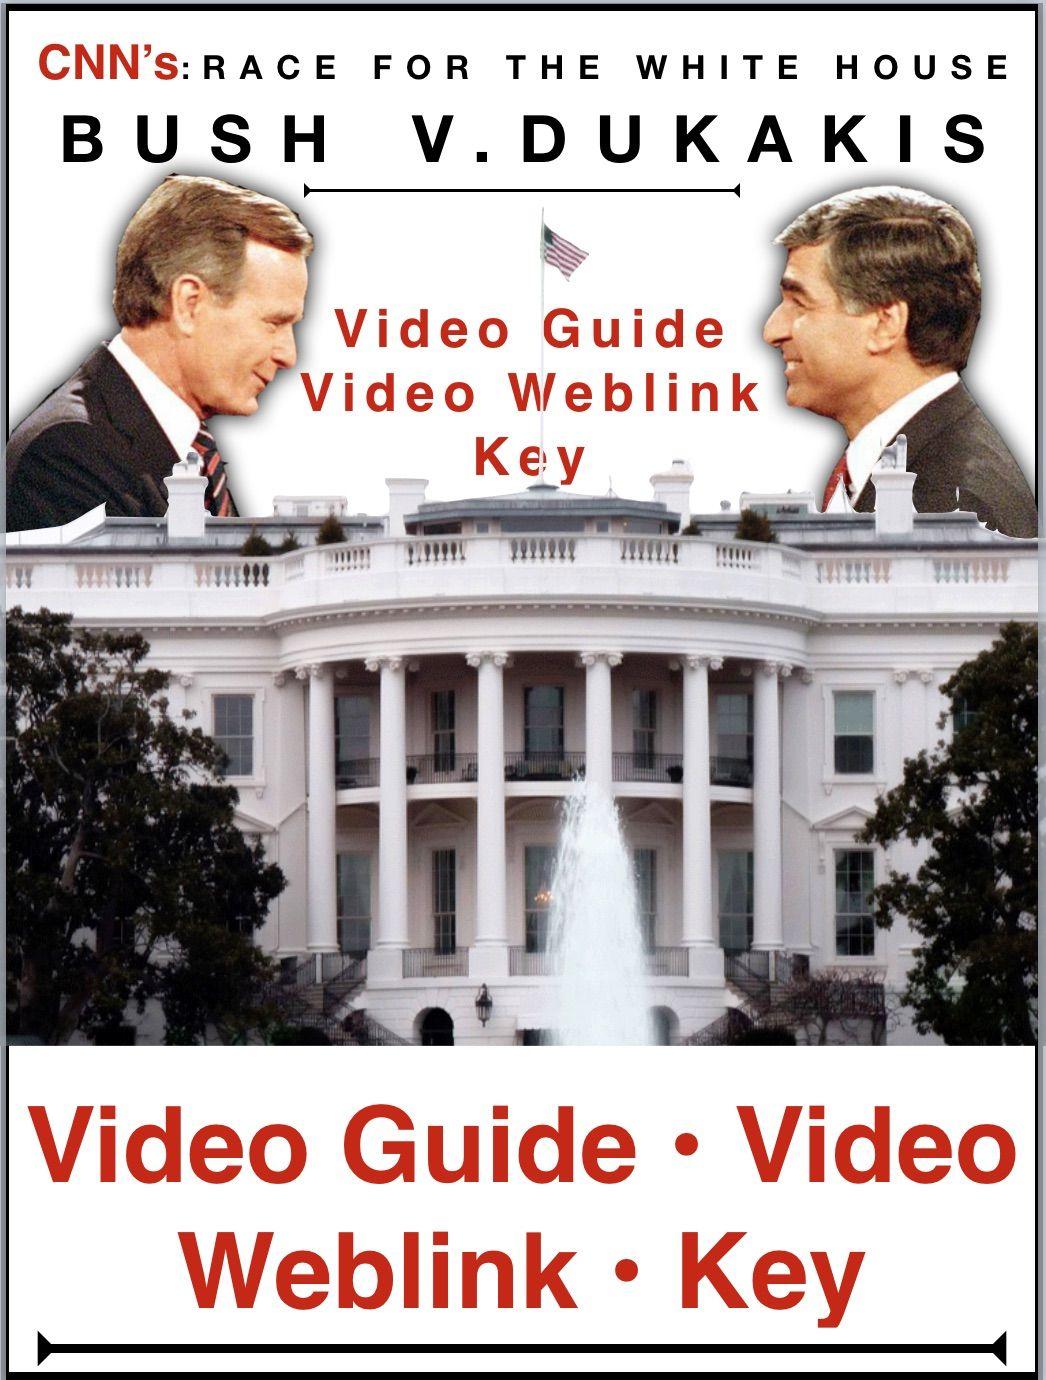 Race To The Whitehouse Bush V Dukakis Video Guide Video Web Link Key